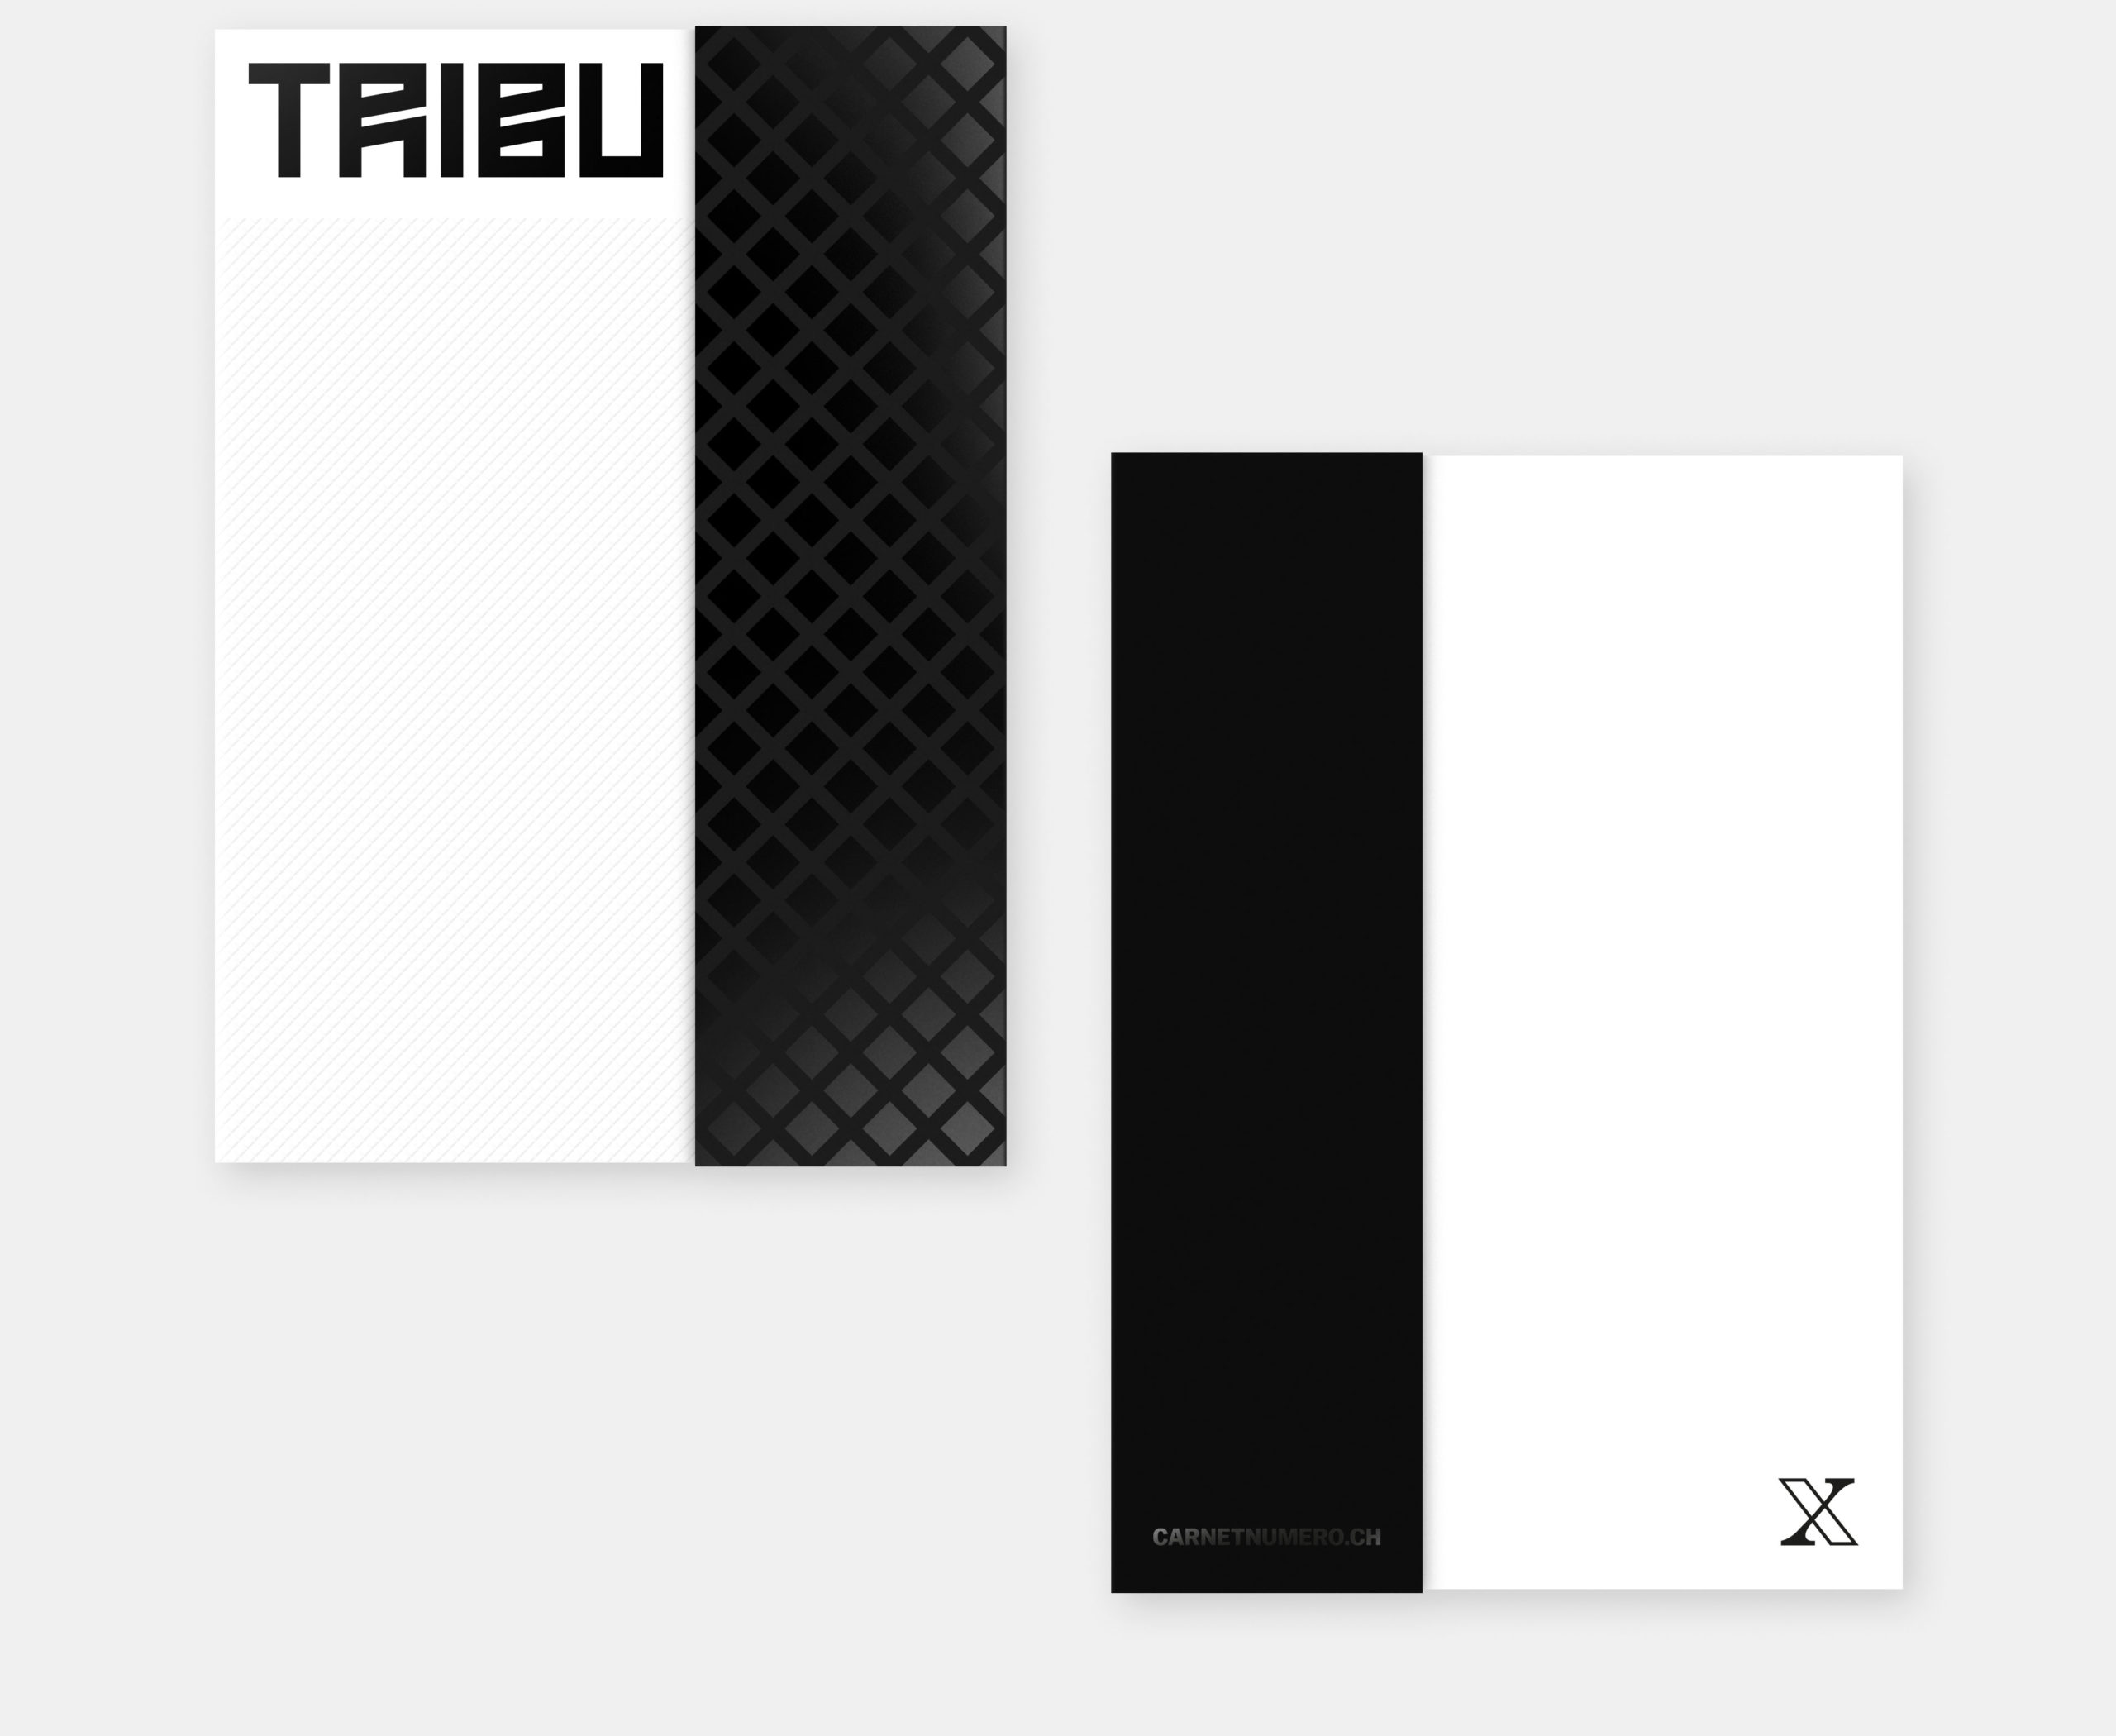 TRIBU_Carnet